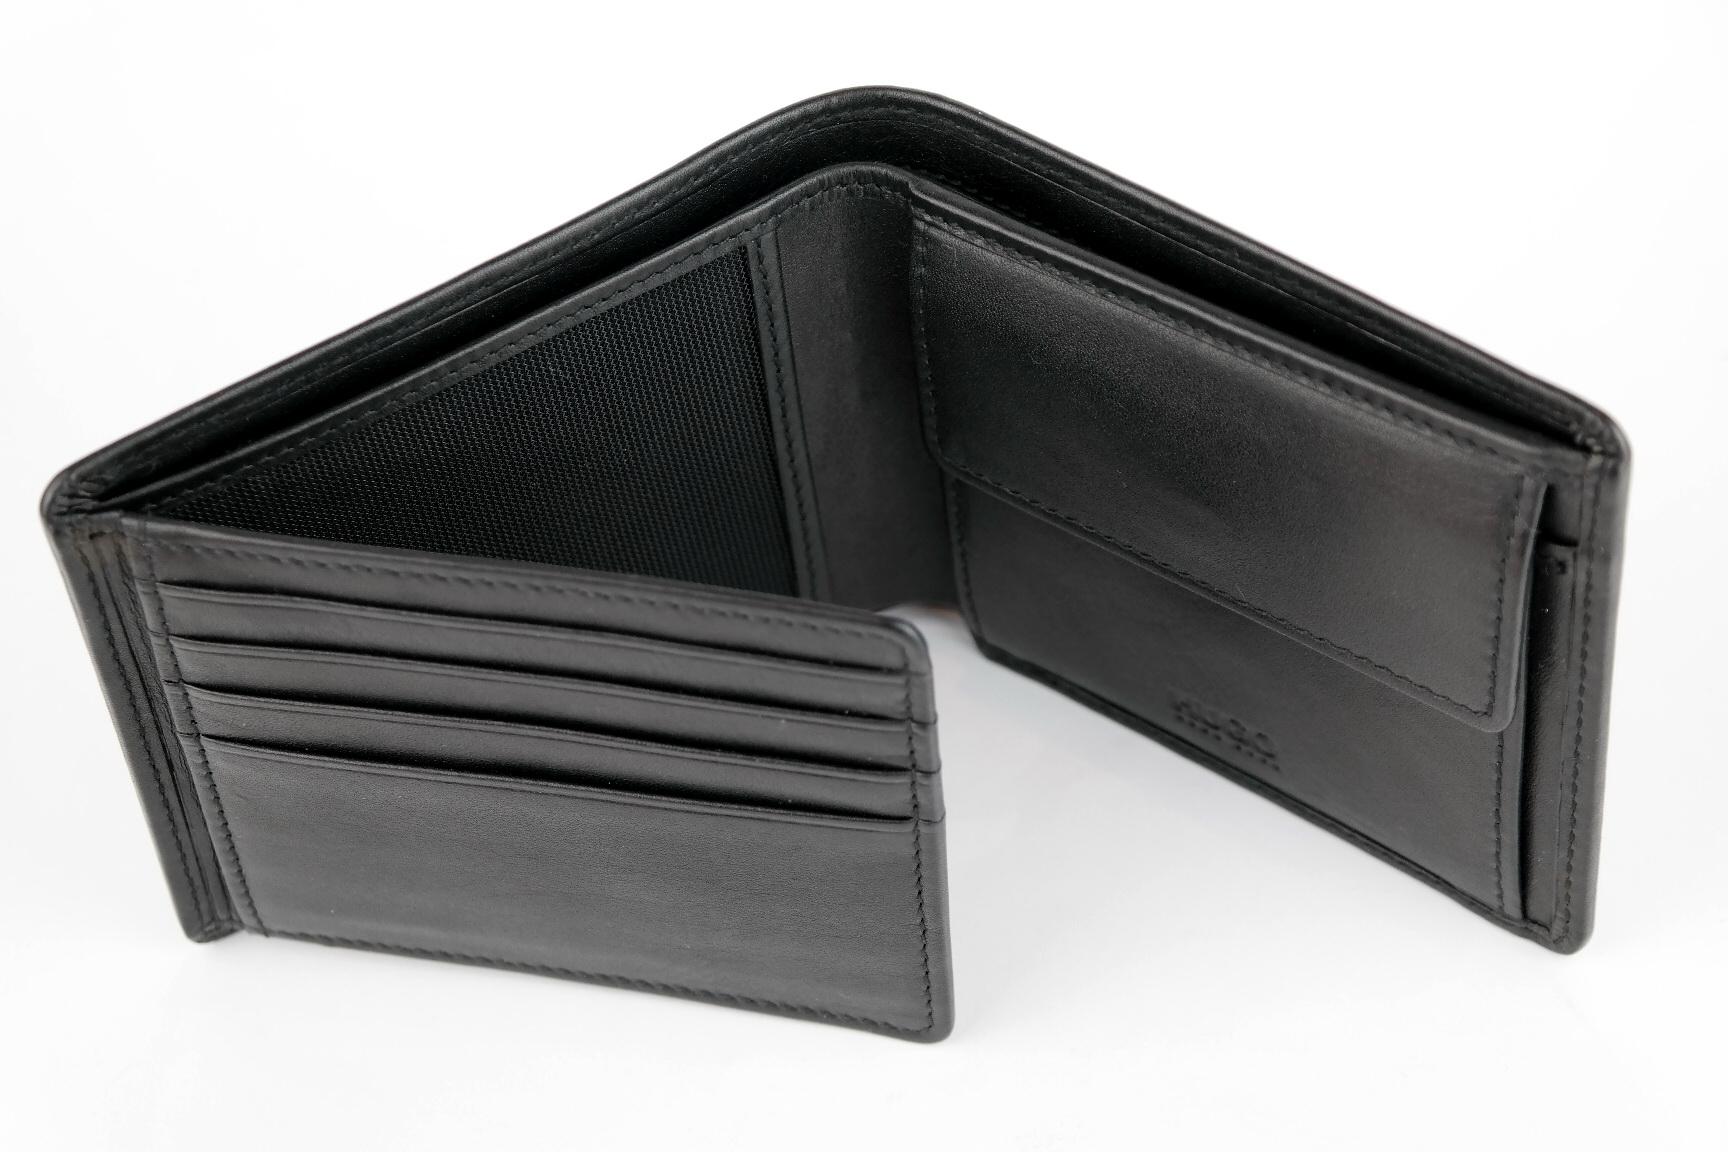 a70c90e9ac342 HUGO BOSS JBasic Portfel męski czarny karty bilon - 6975466611 ...